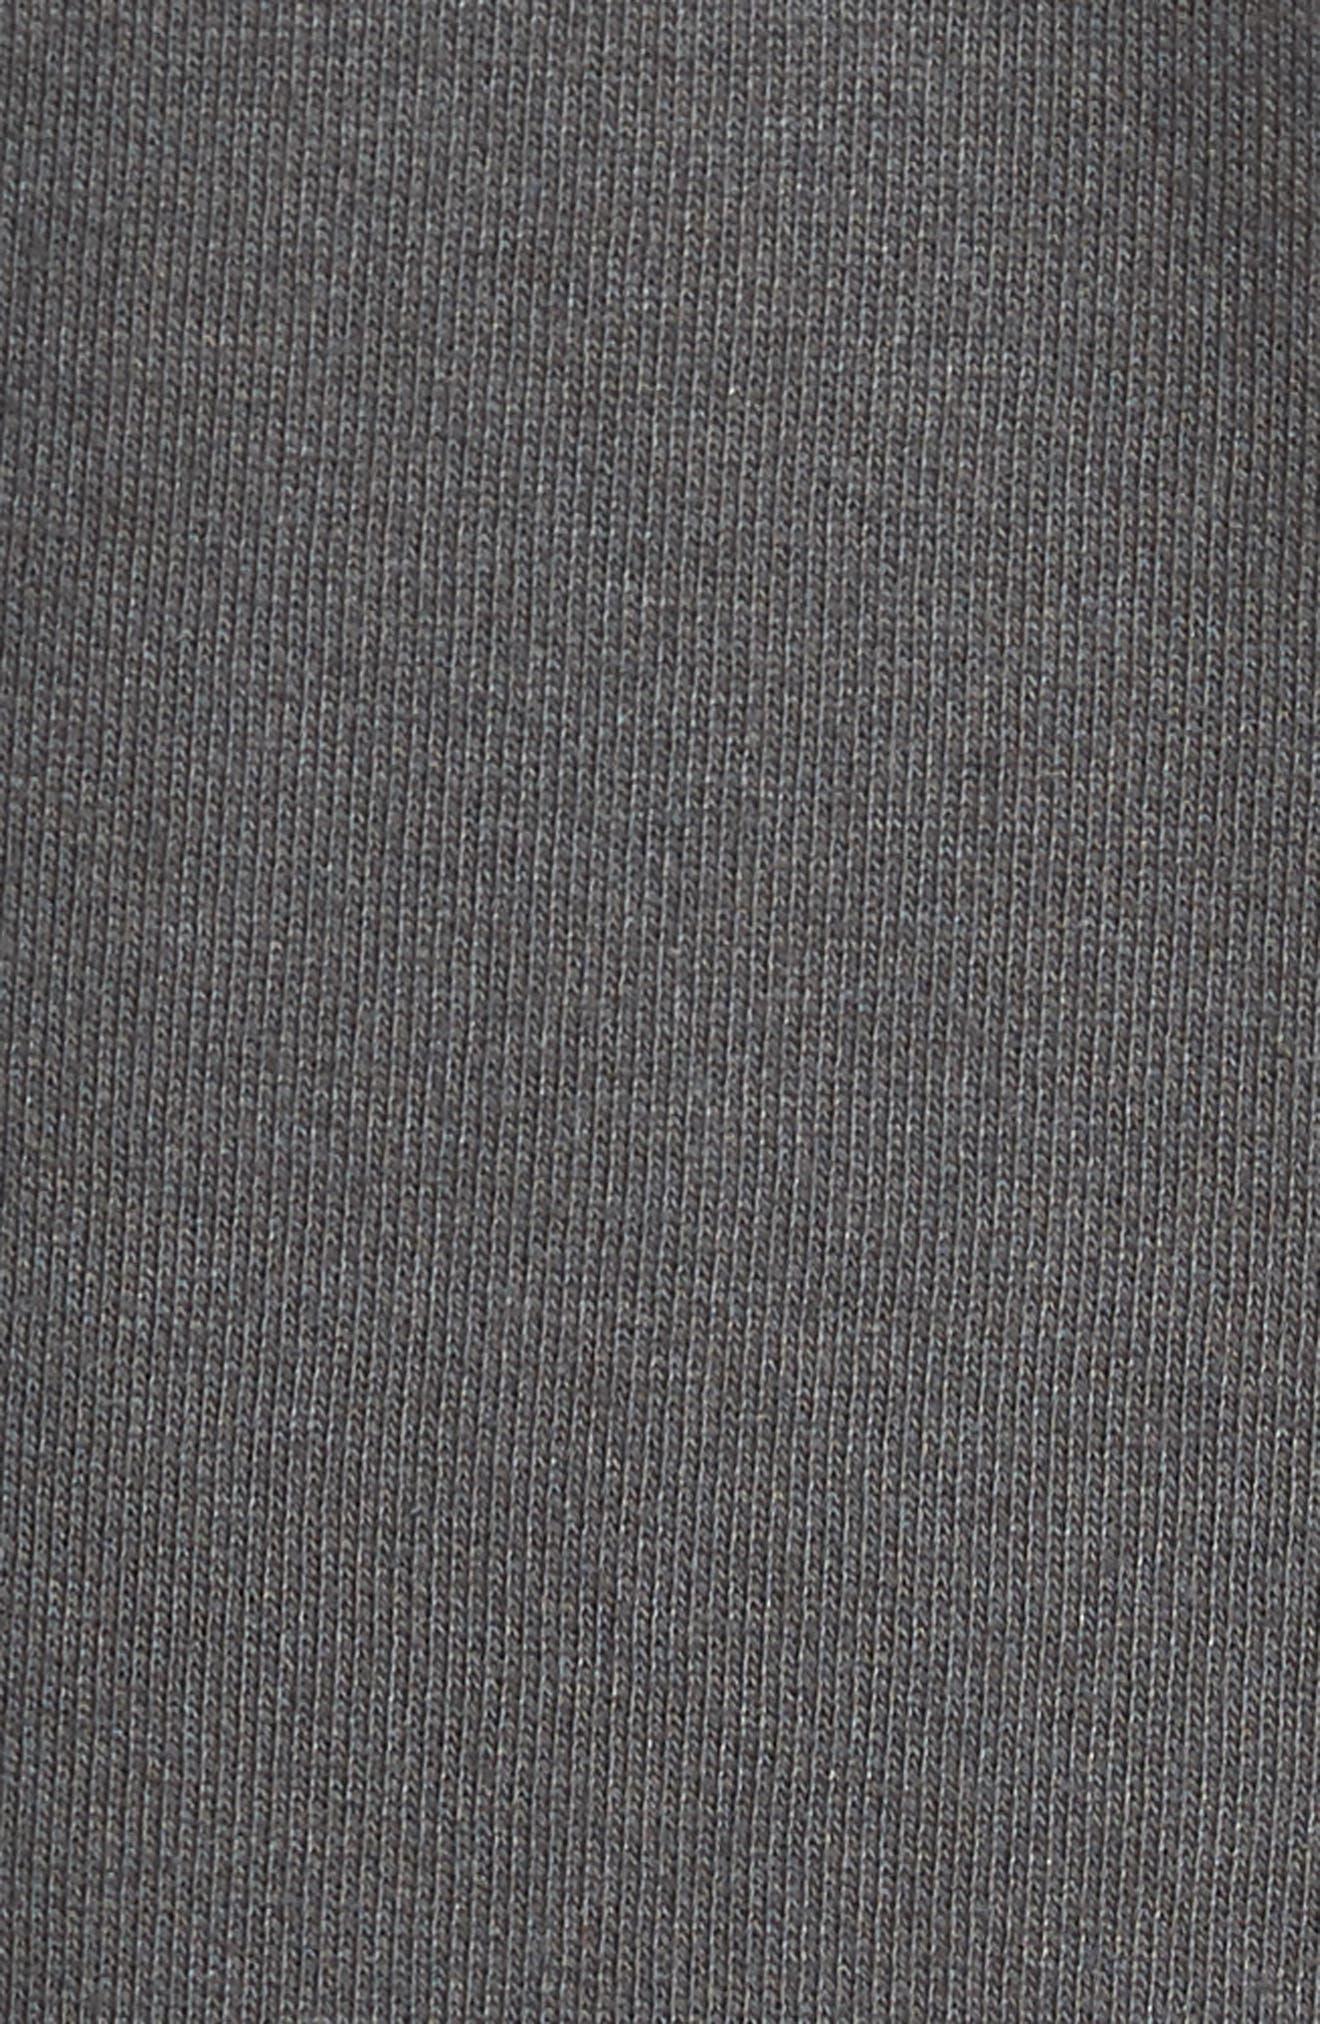 Oversize Fleece Sweatshirt,                             Alternate thumbnail 5, color,                             020